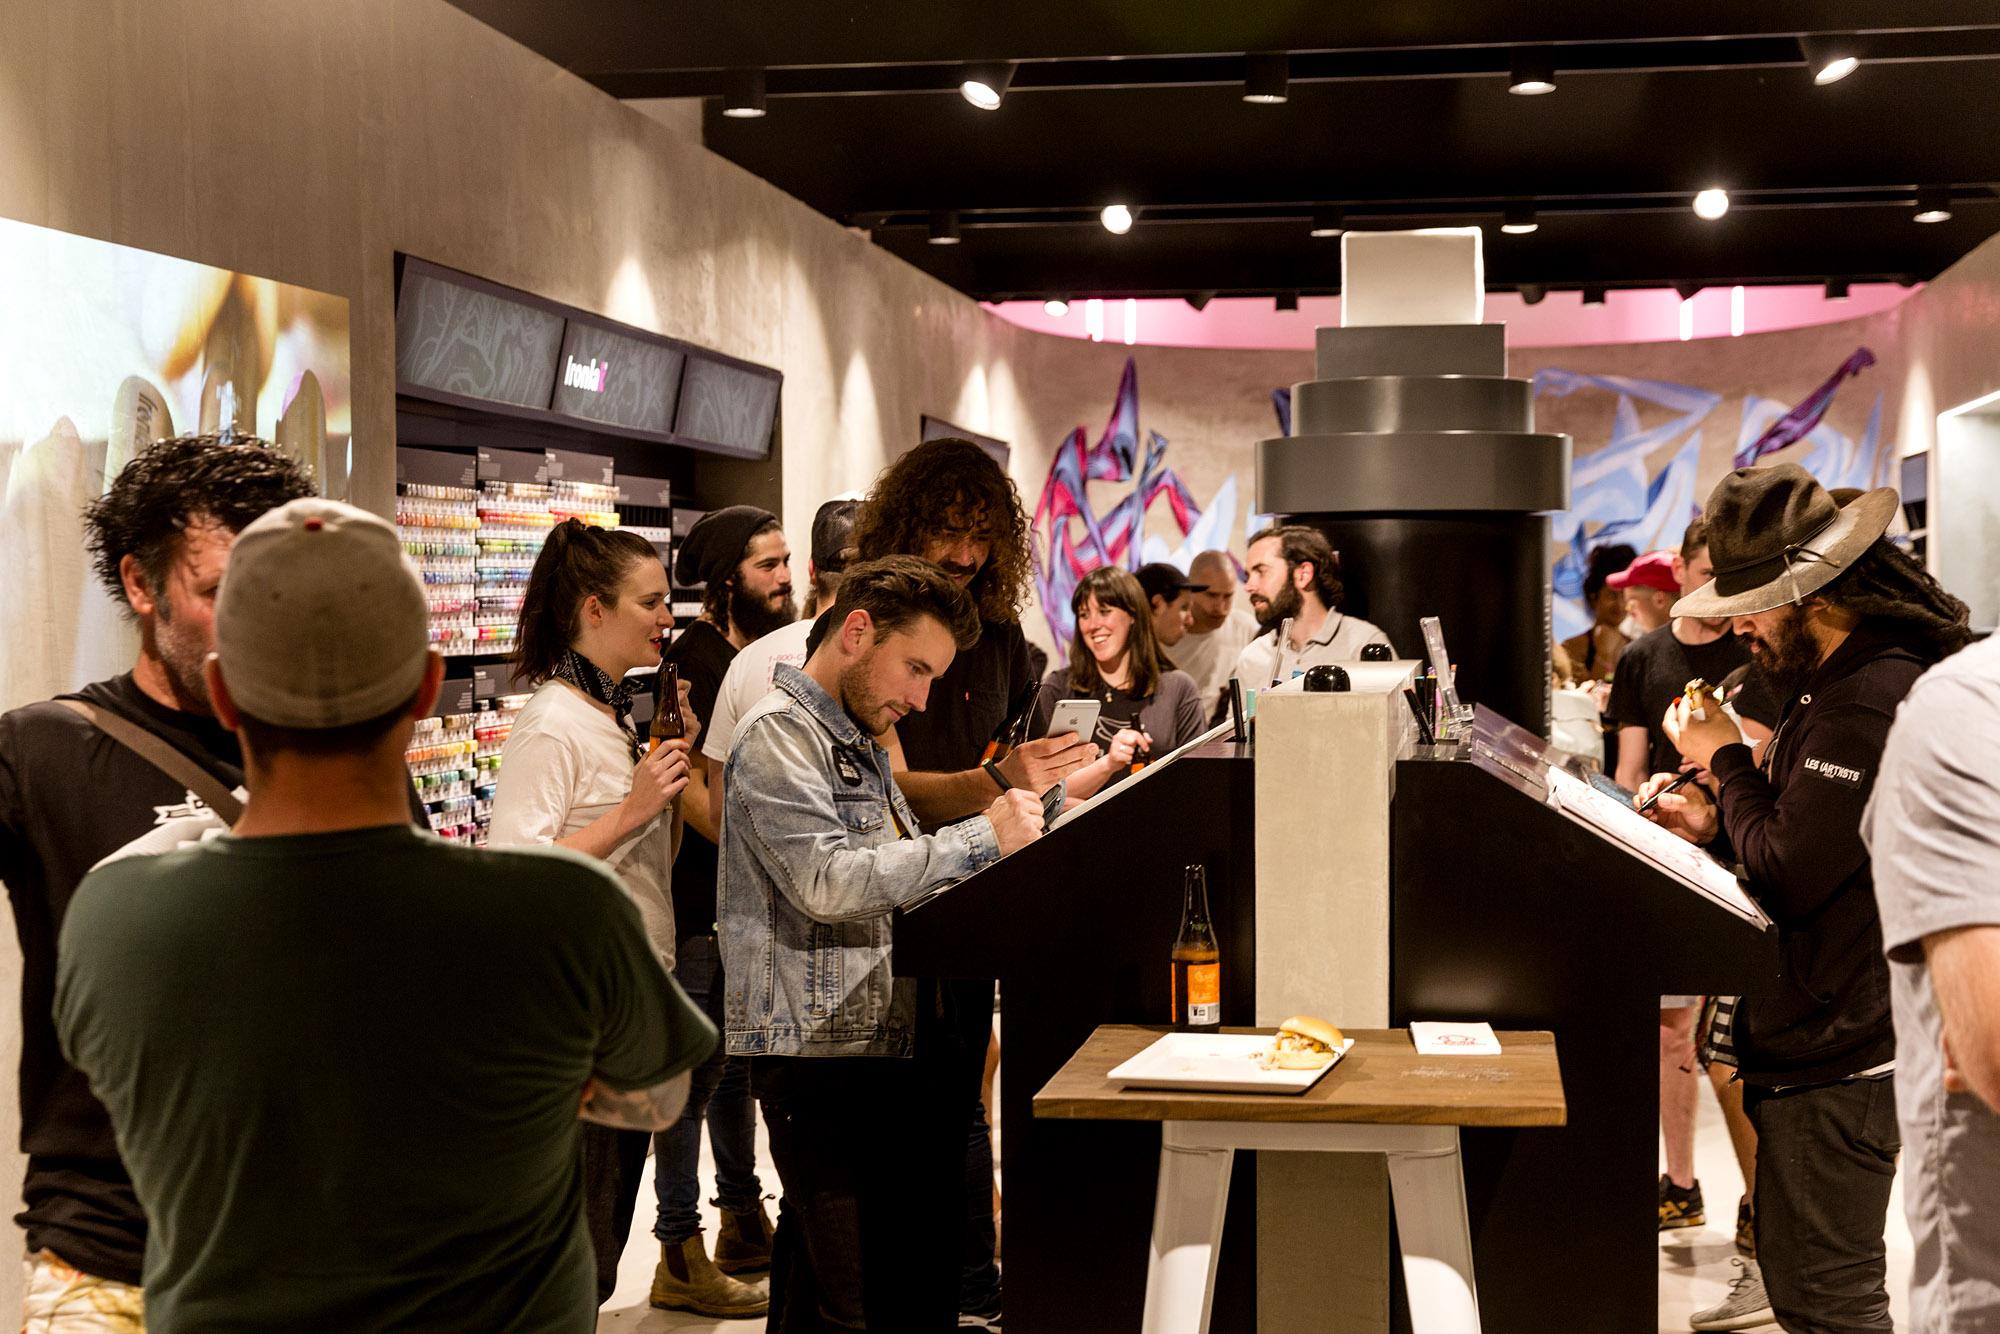 A work by Does - Opening night ironlak shop sydney 9